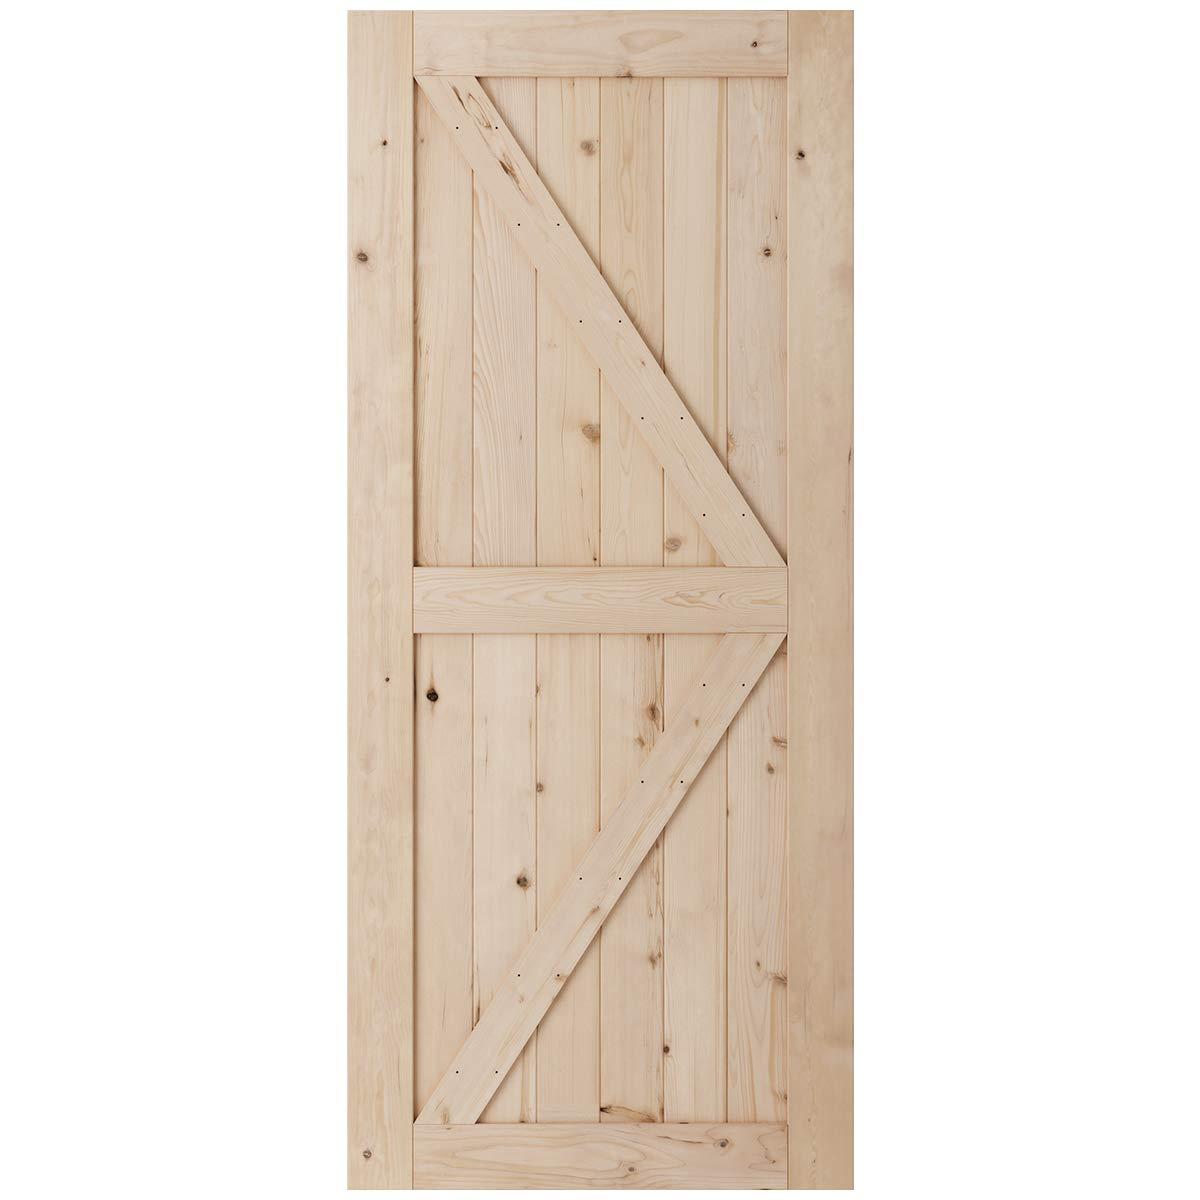 SmartStandard 36in x 84in Sliding Barn Wood Door Pre-Drilled Ready to Assemble, DIY Unfinished Solid Hemlock Wood Panelled Slab, Interior Single Door Only, Natural, K-Frame (Fit 6FT-6.6FT Rail) by SMARTSTANDARD